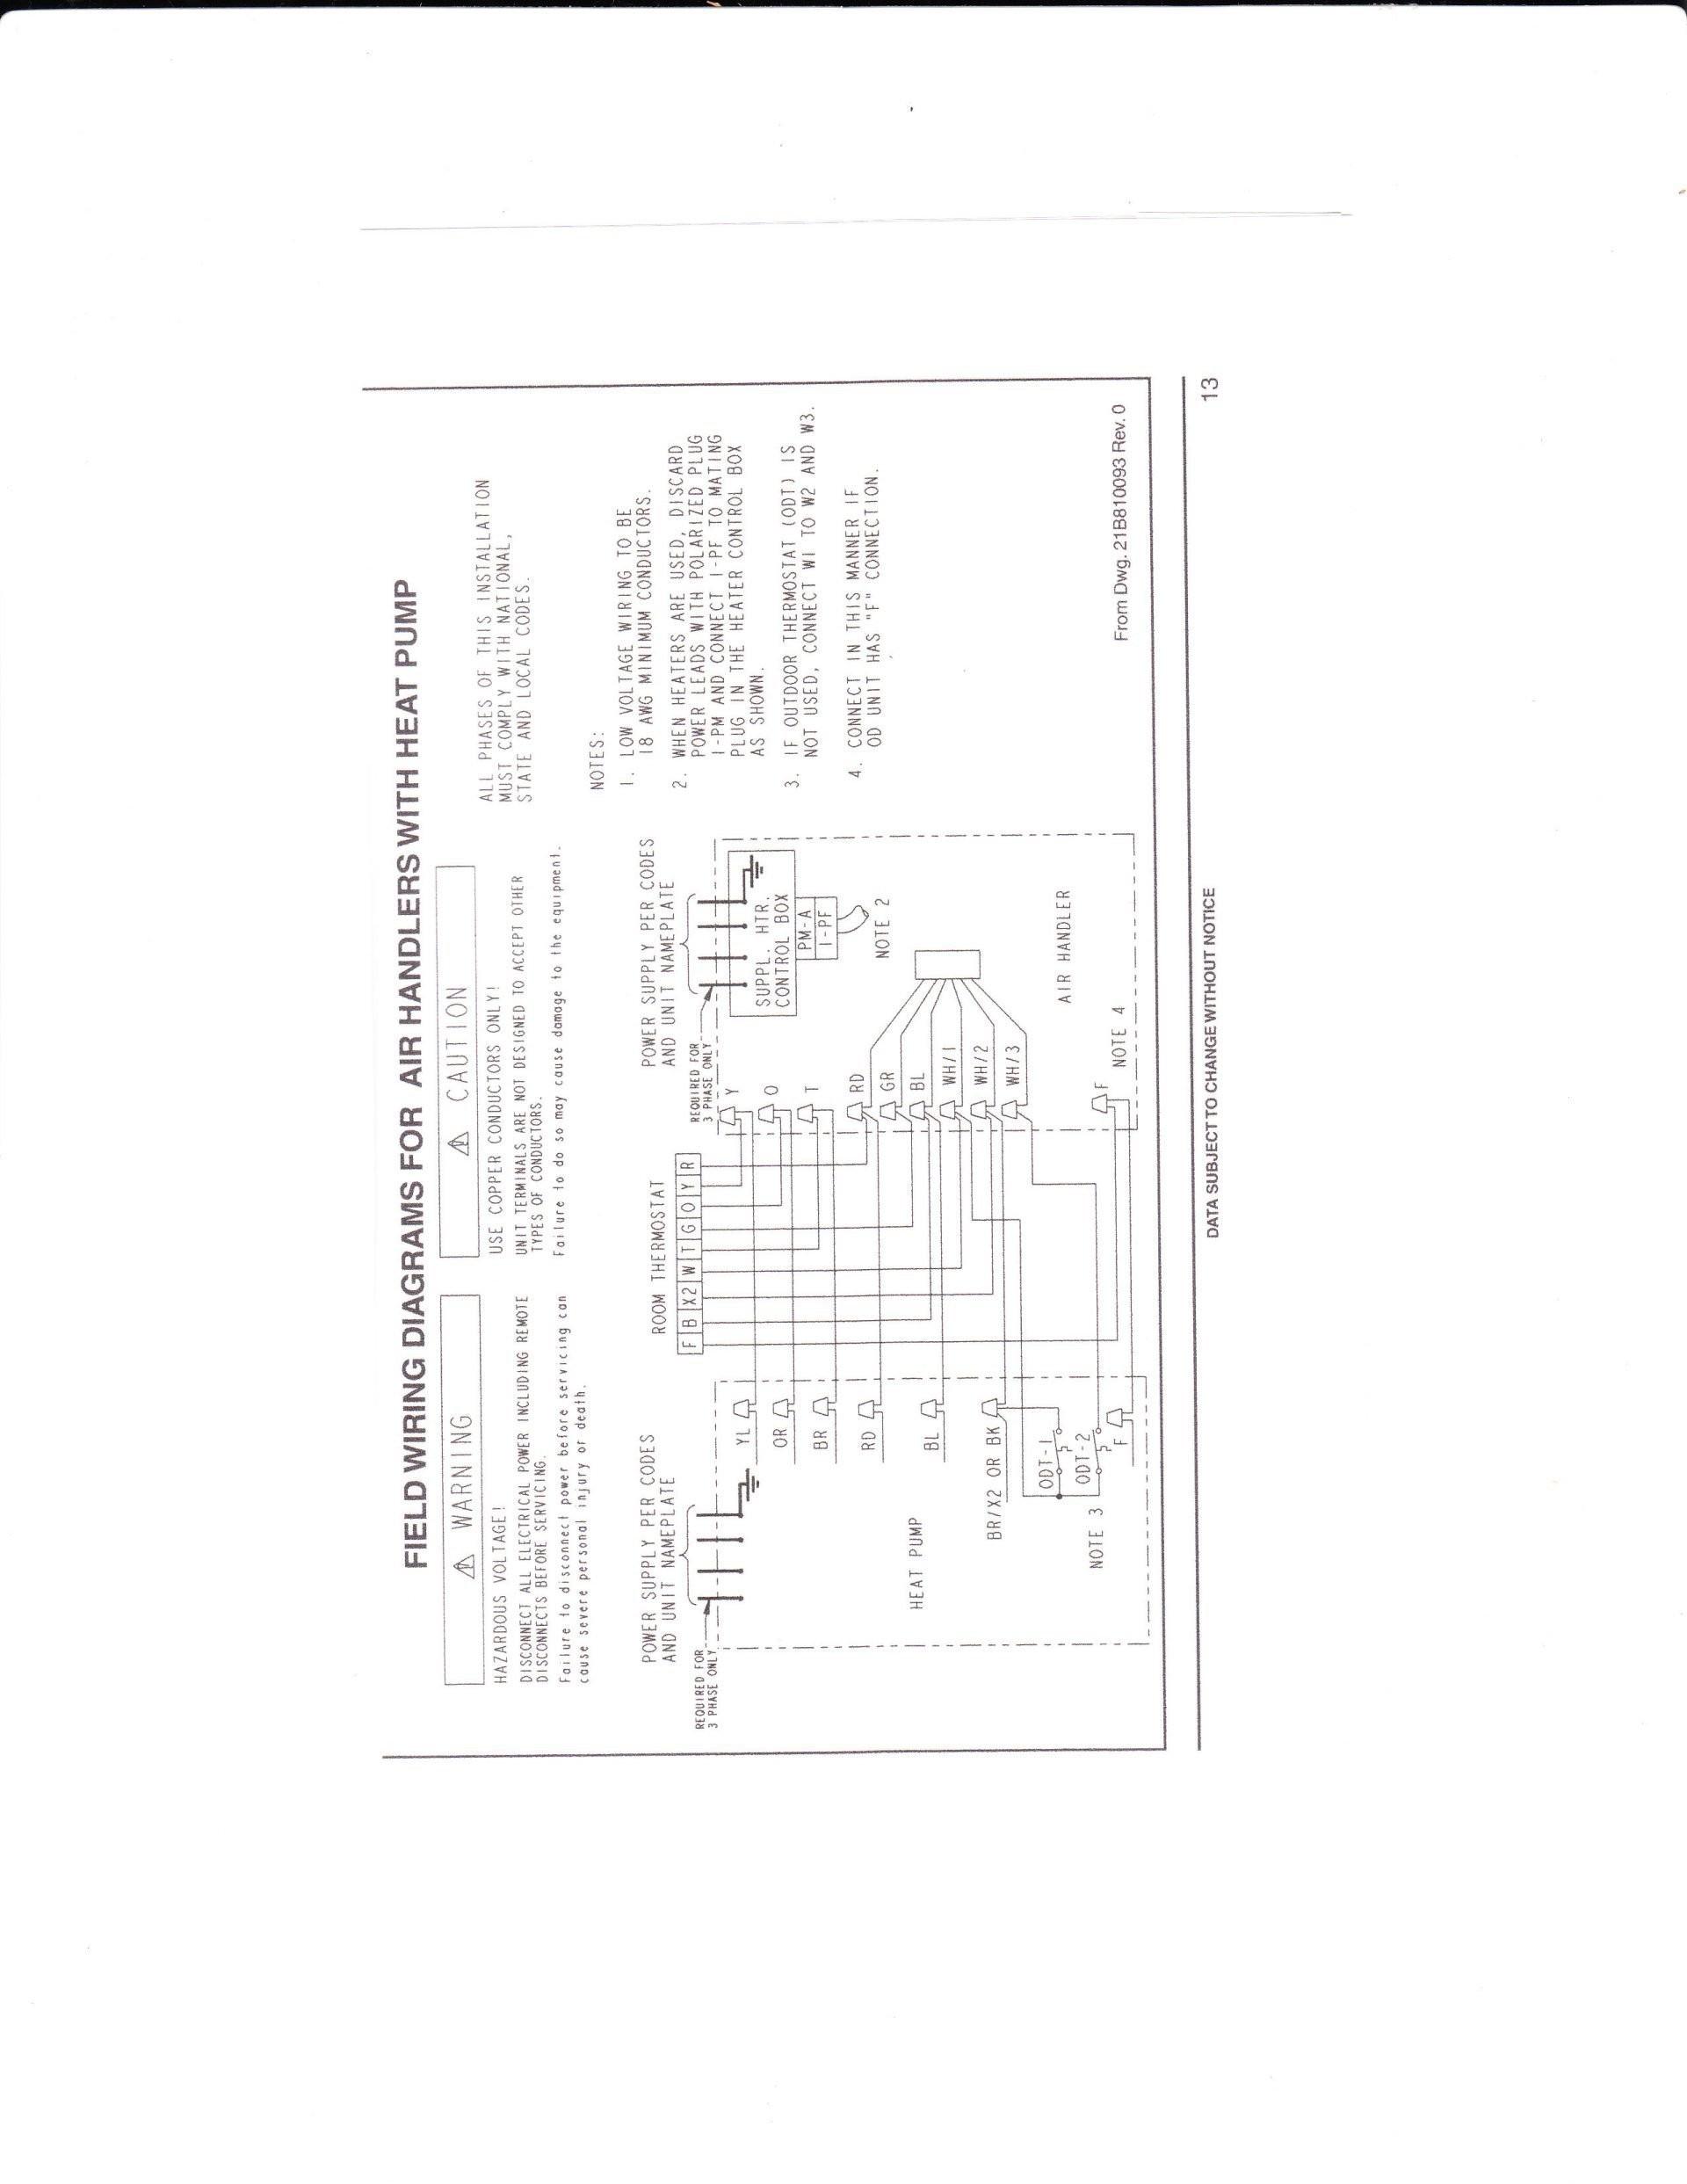 Wiring Diagram General Electric Air Compressor Wiring Diagram